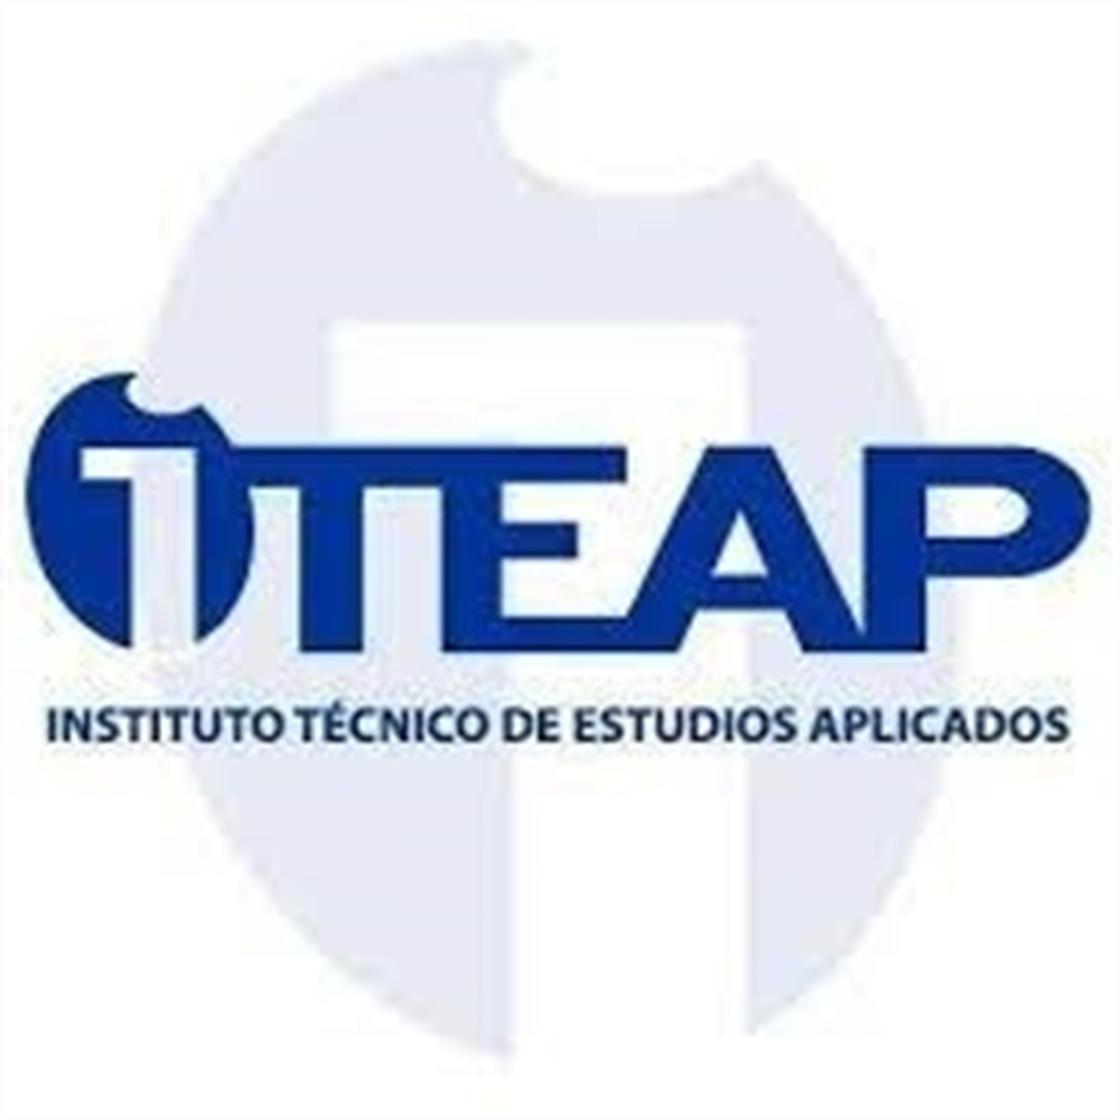 ITEAP formación